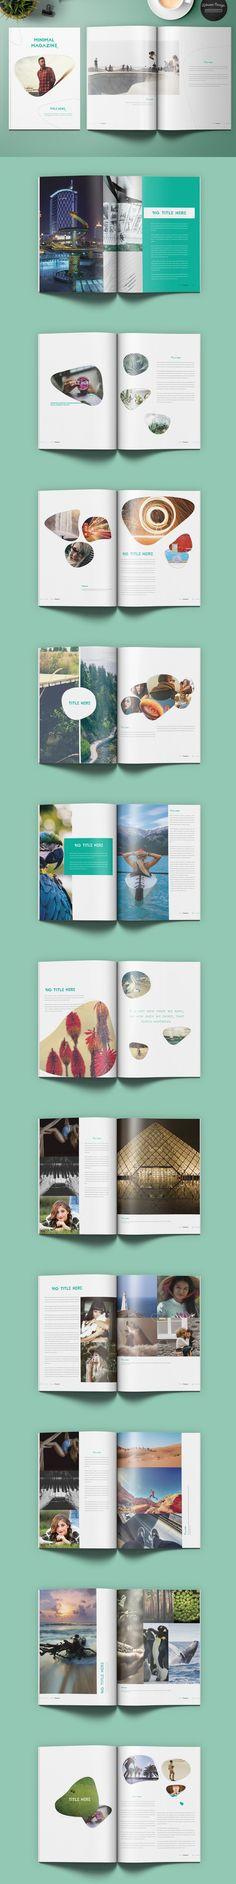 Minimal Magazine. Magazine Templates. $18.00